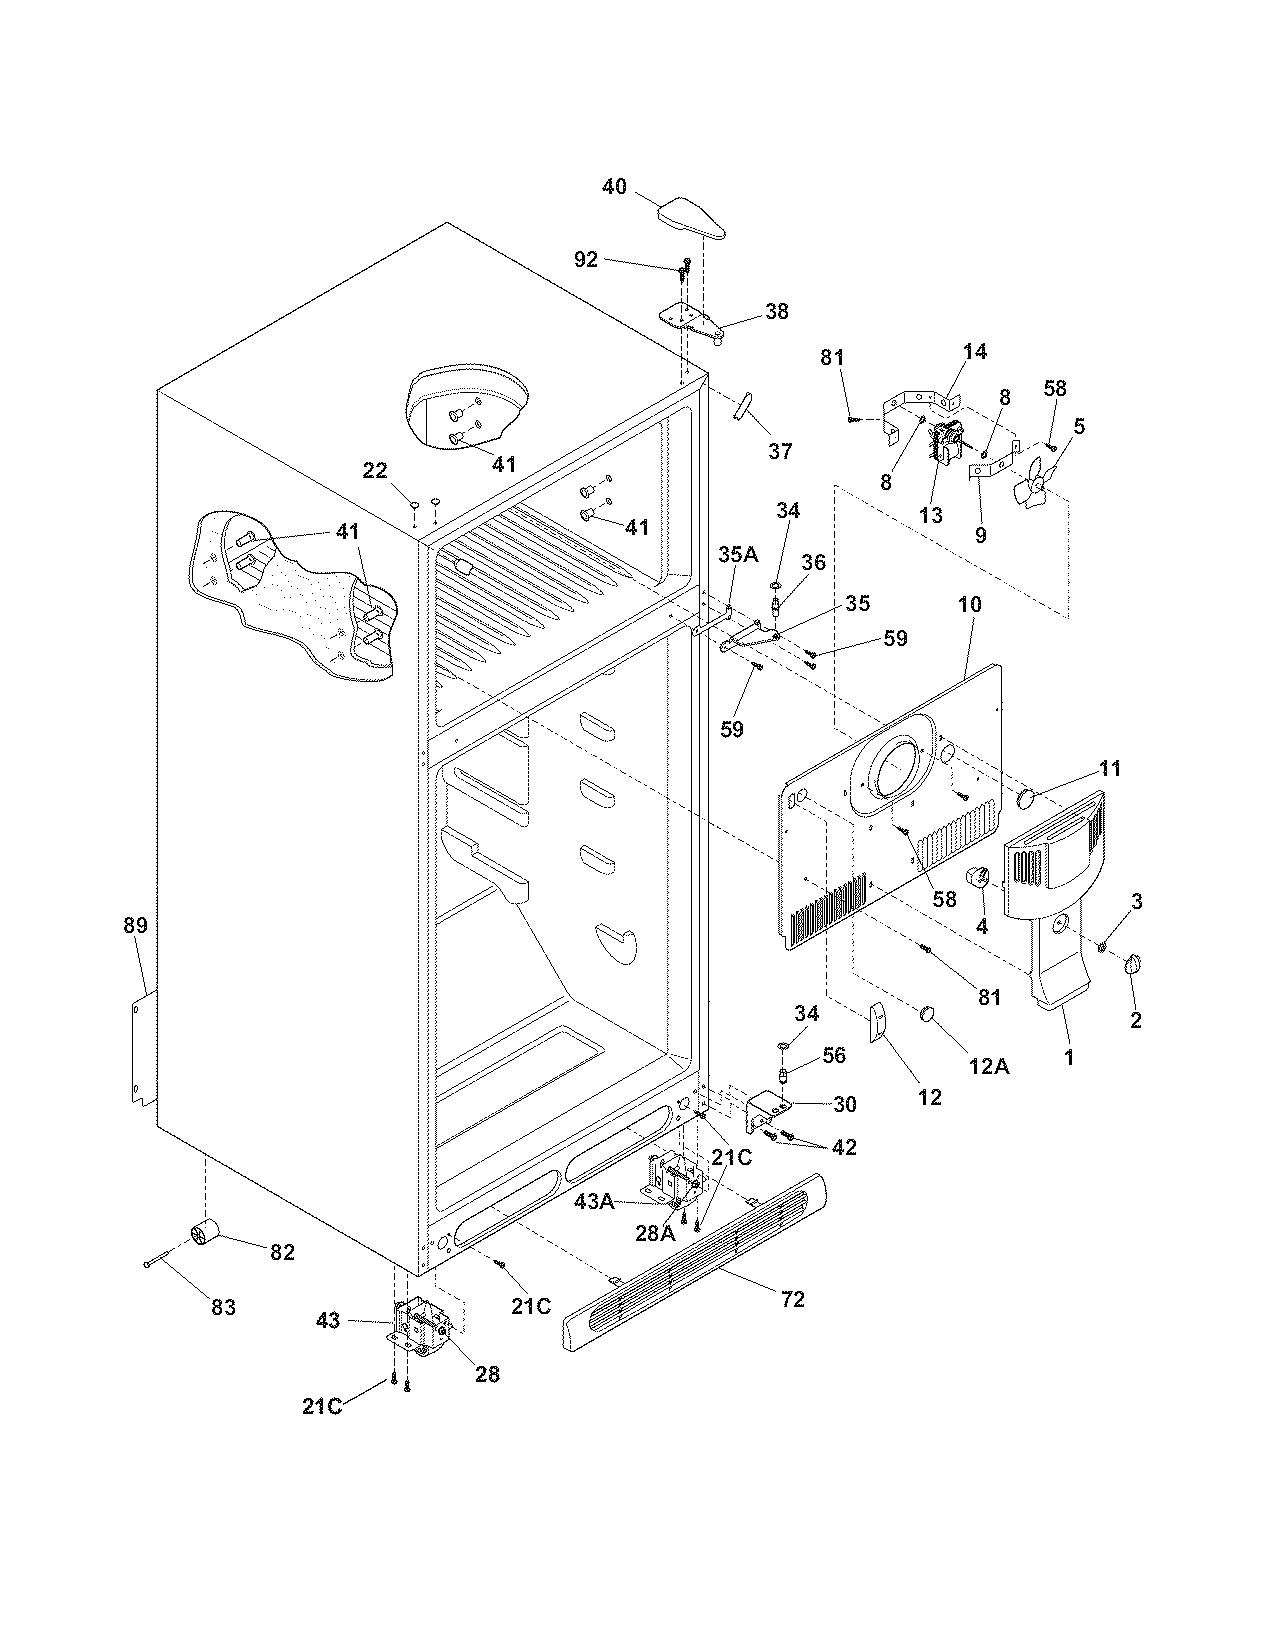 Crosley model CRTE181AW3 top-mount refrigerator genuine parts